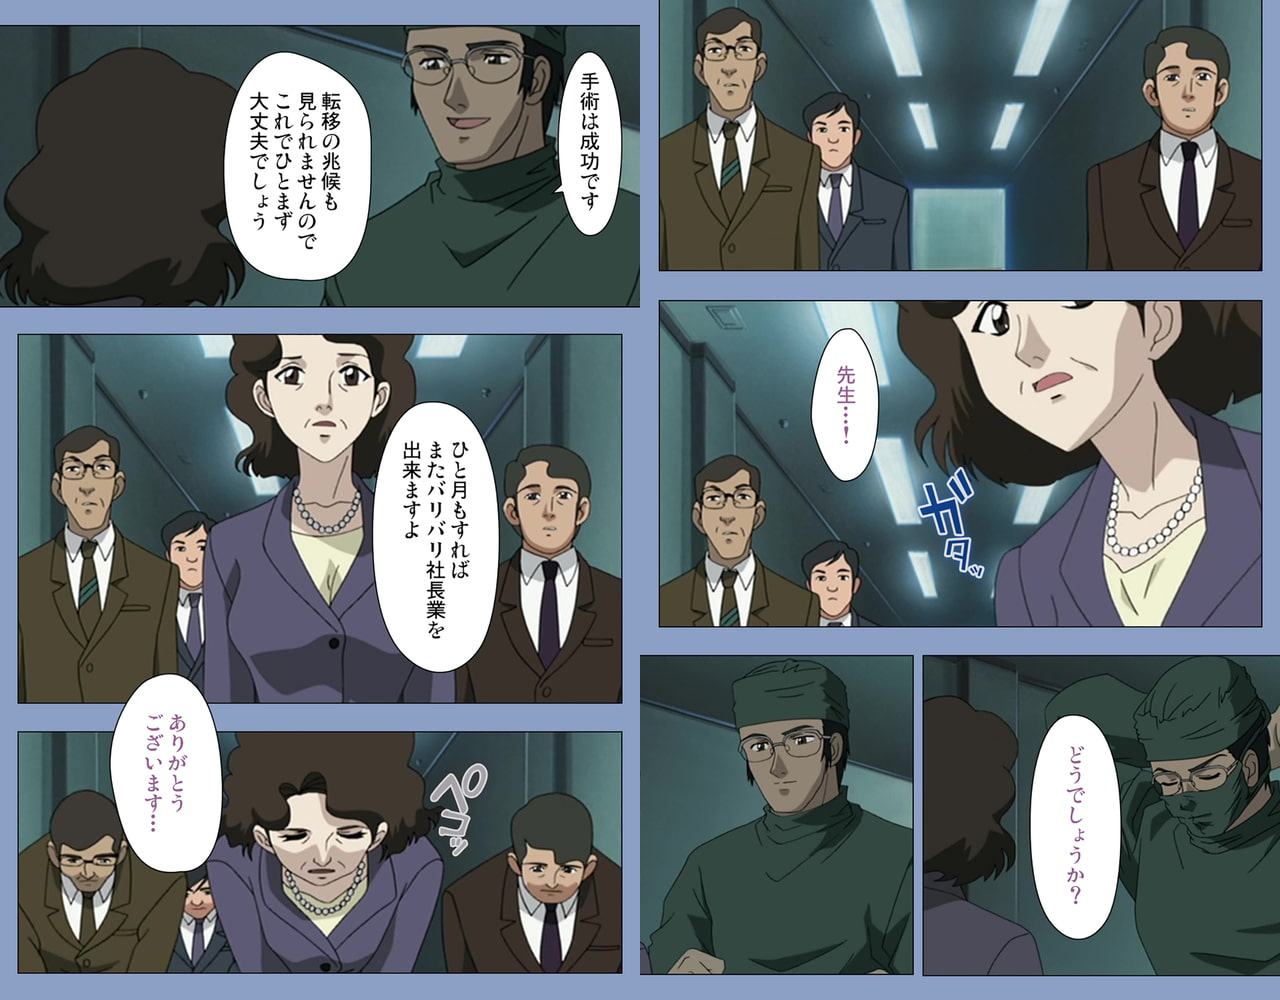 【フルカラー成人版】淫獄病棟 前編 Complete版